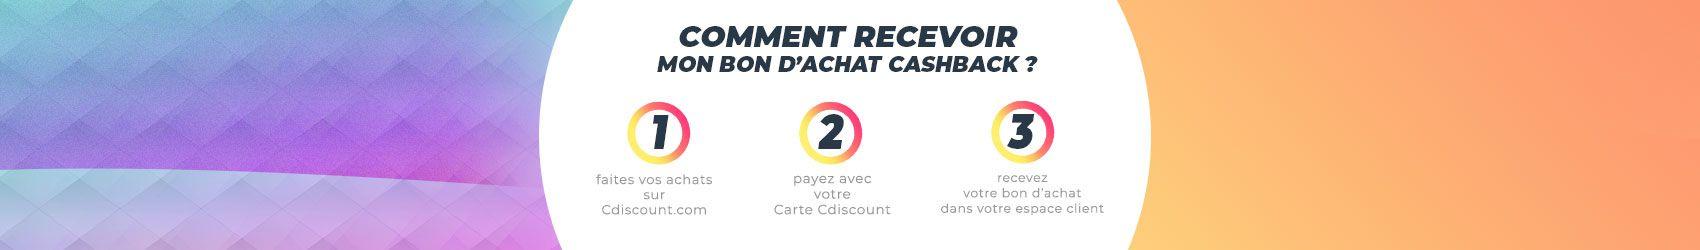 Carte Cdiscount Sans Frais.Cashback Carte Cdiscount Cumulez Des Euros